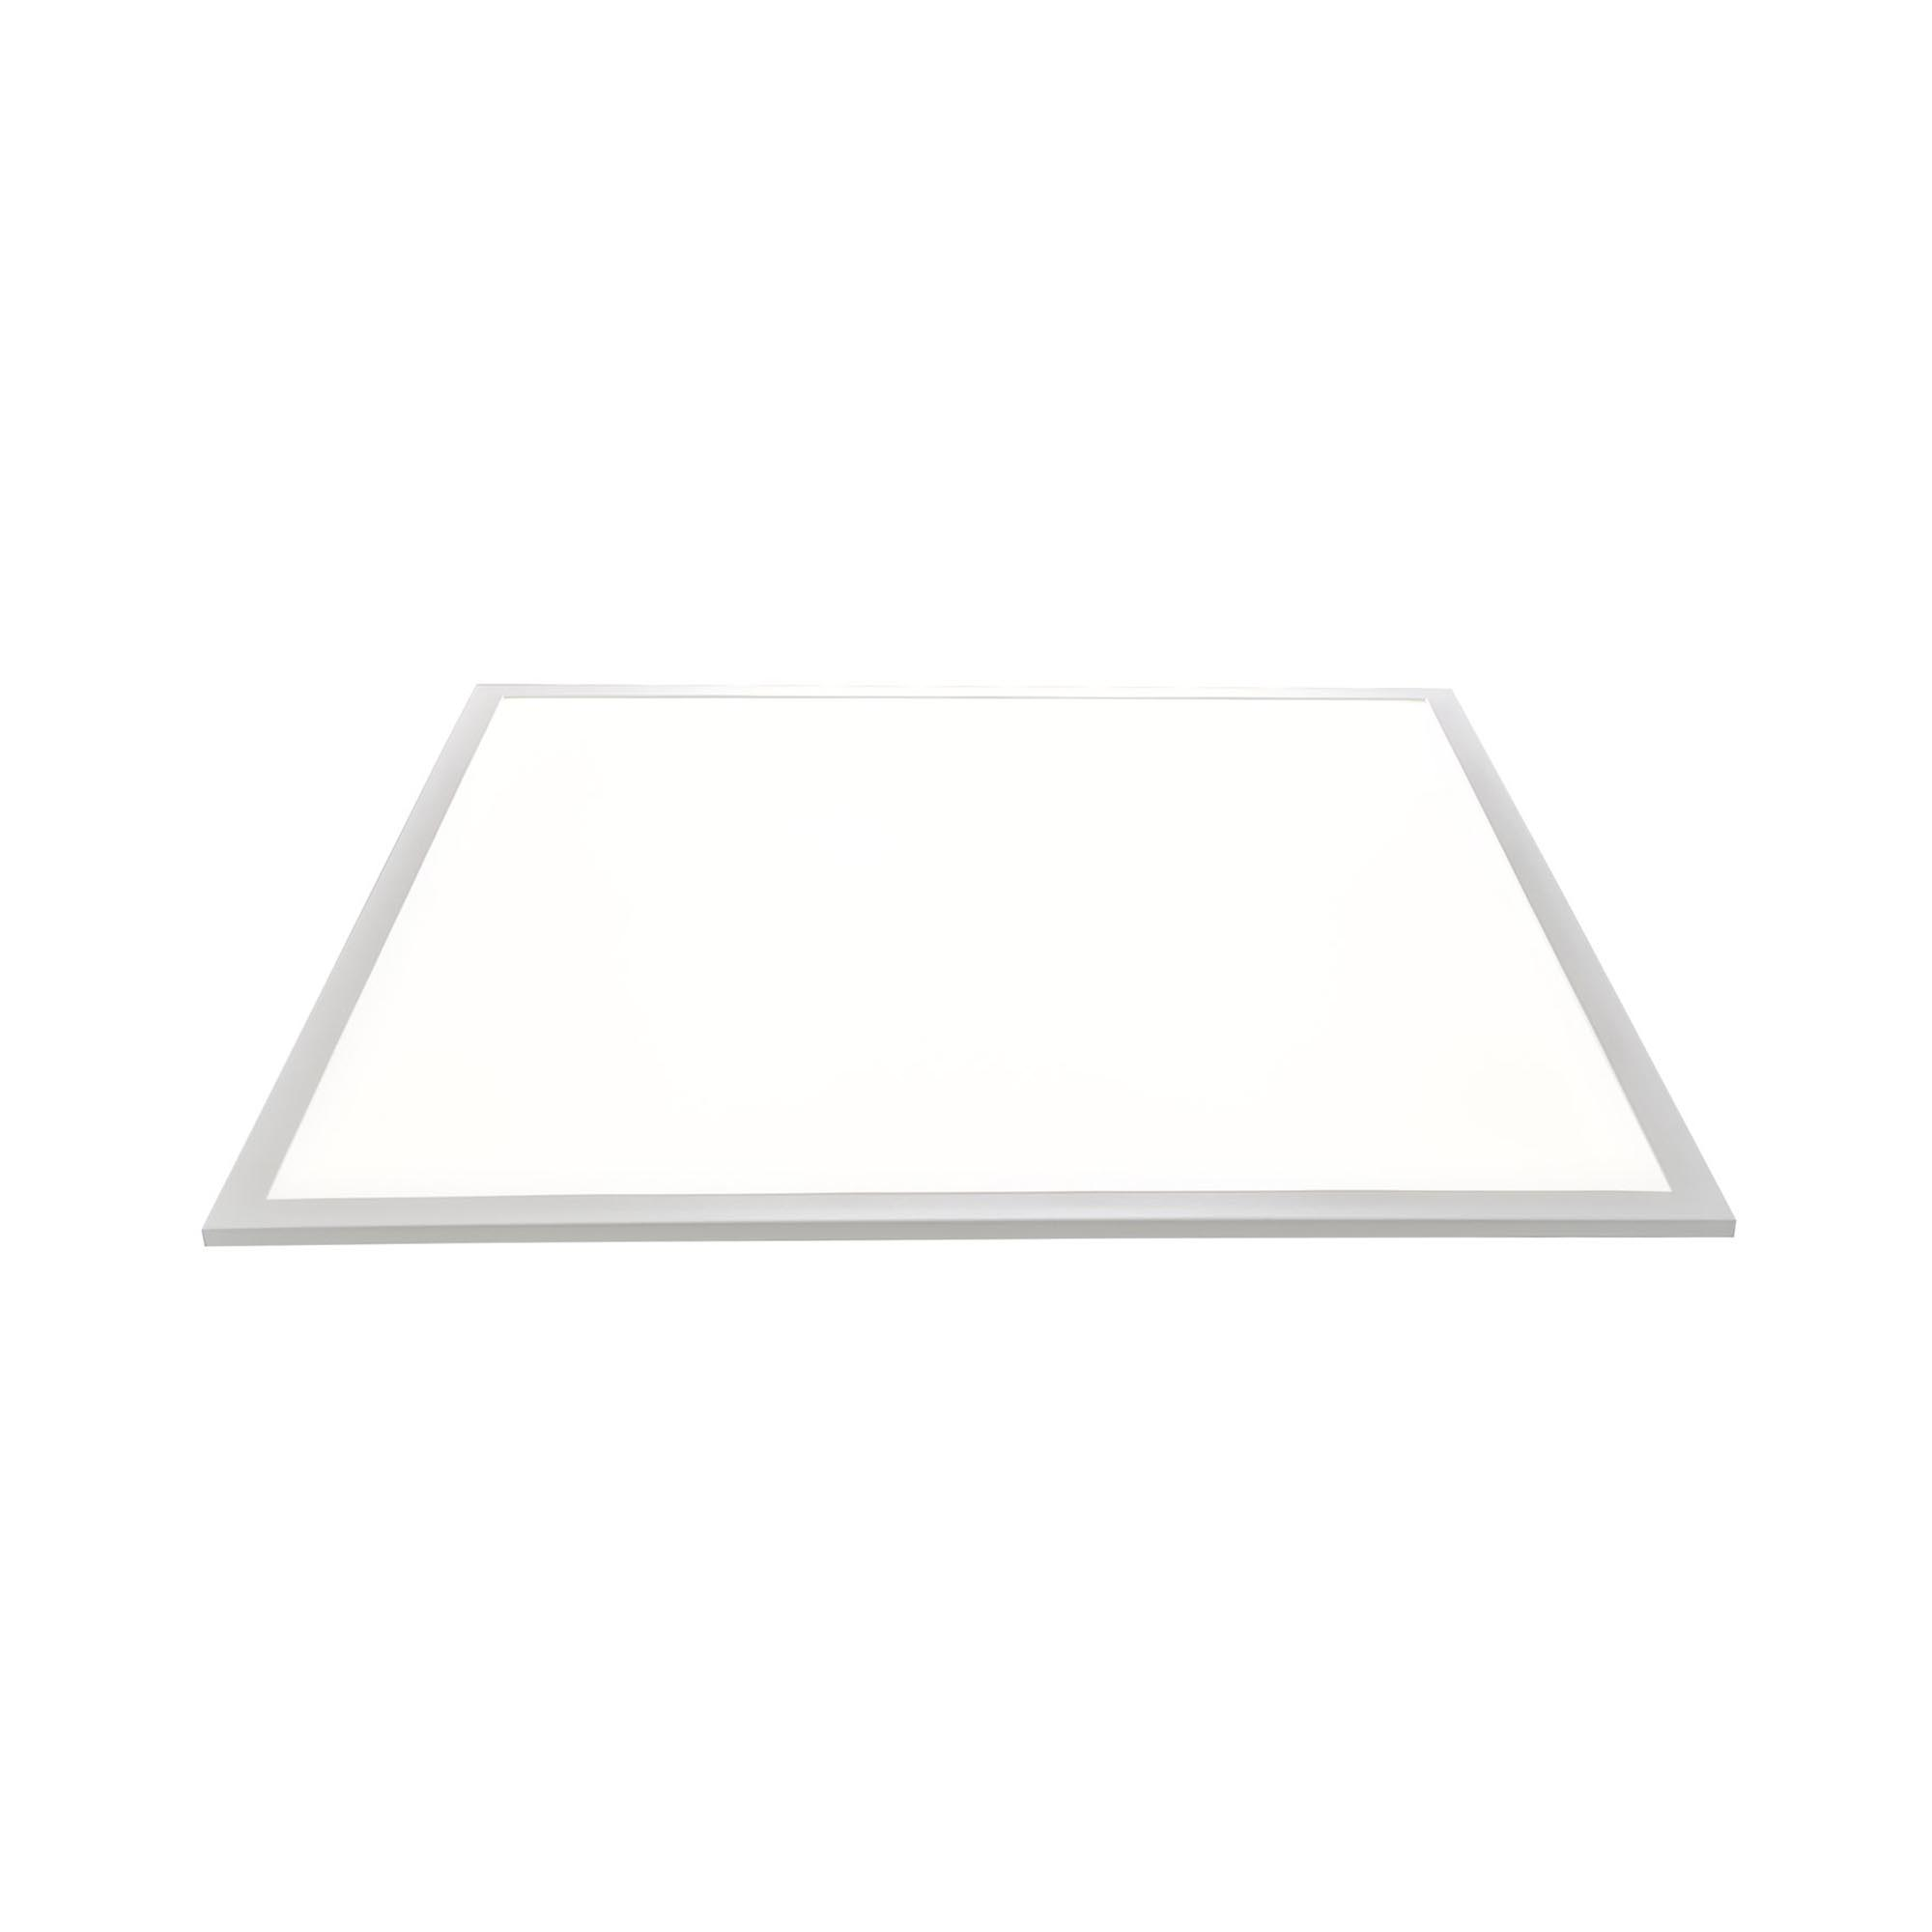 HEITRONIC LED-panel tak - 40 W - 4,000 lumen 10300001